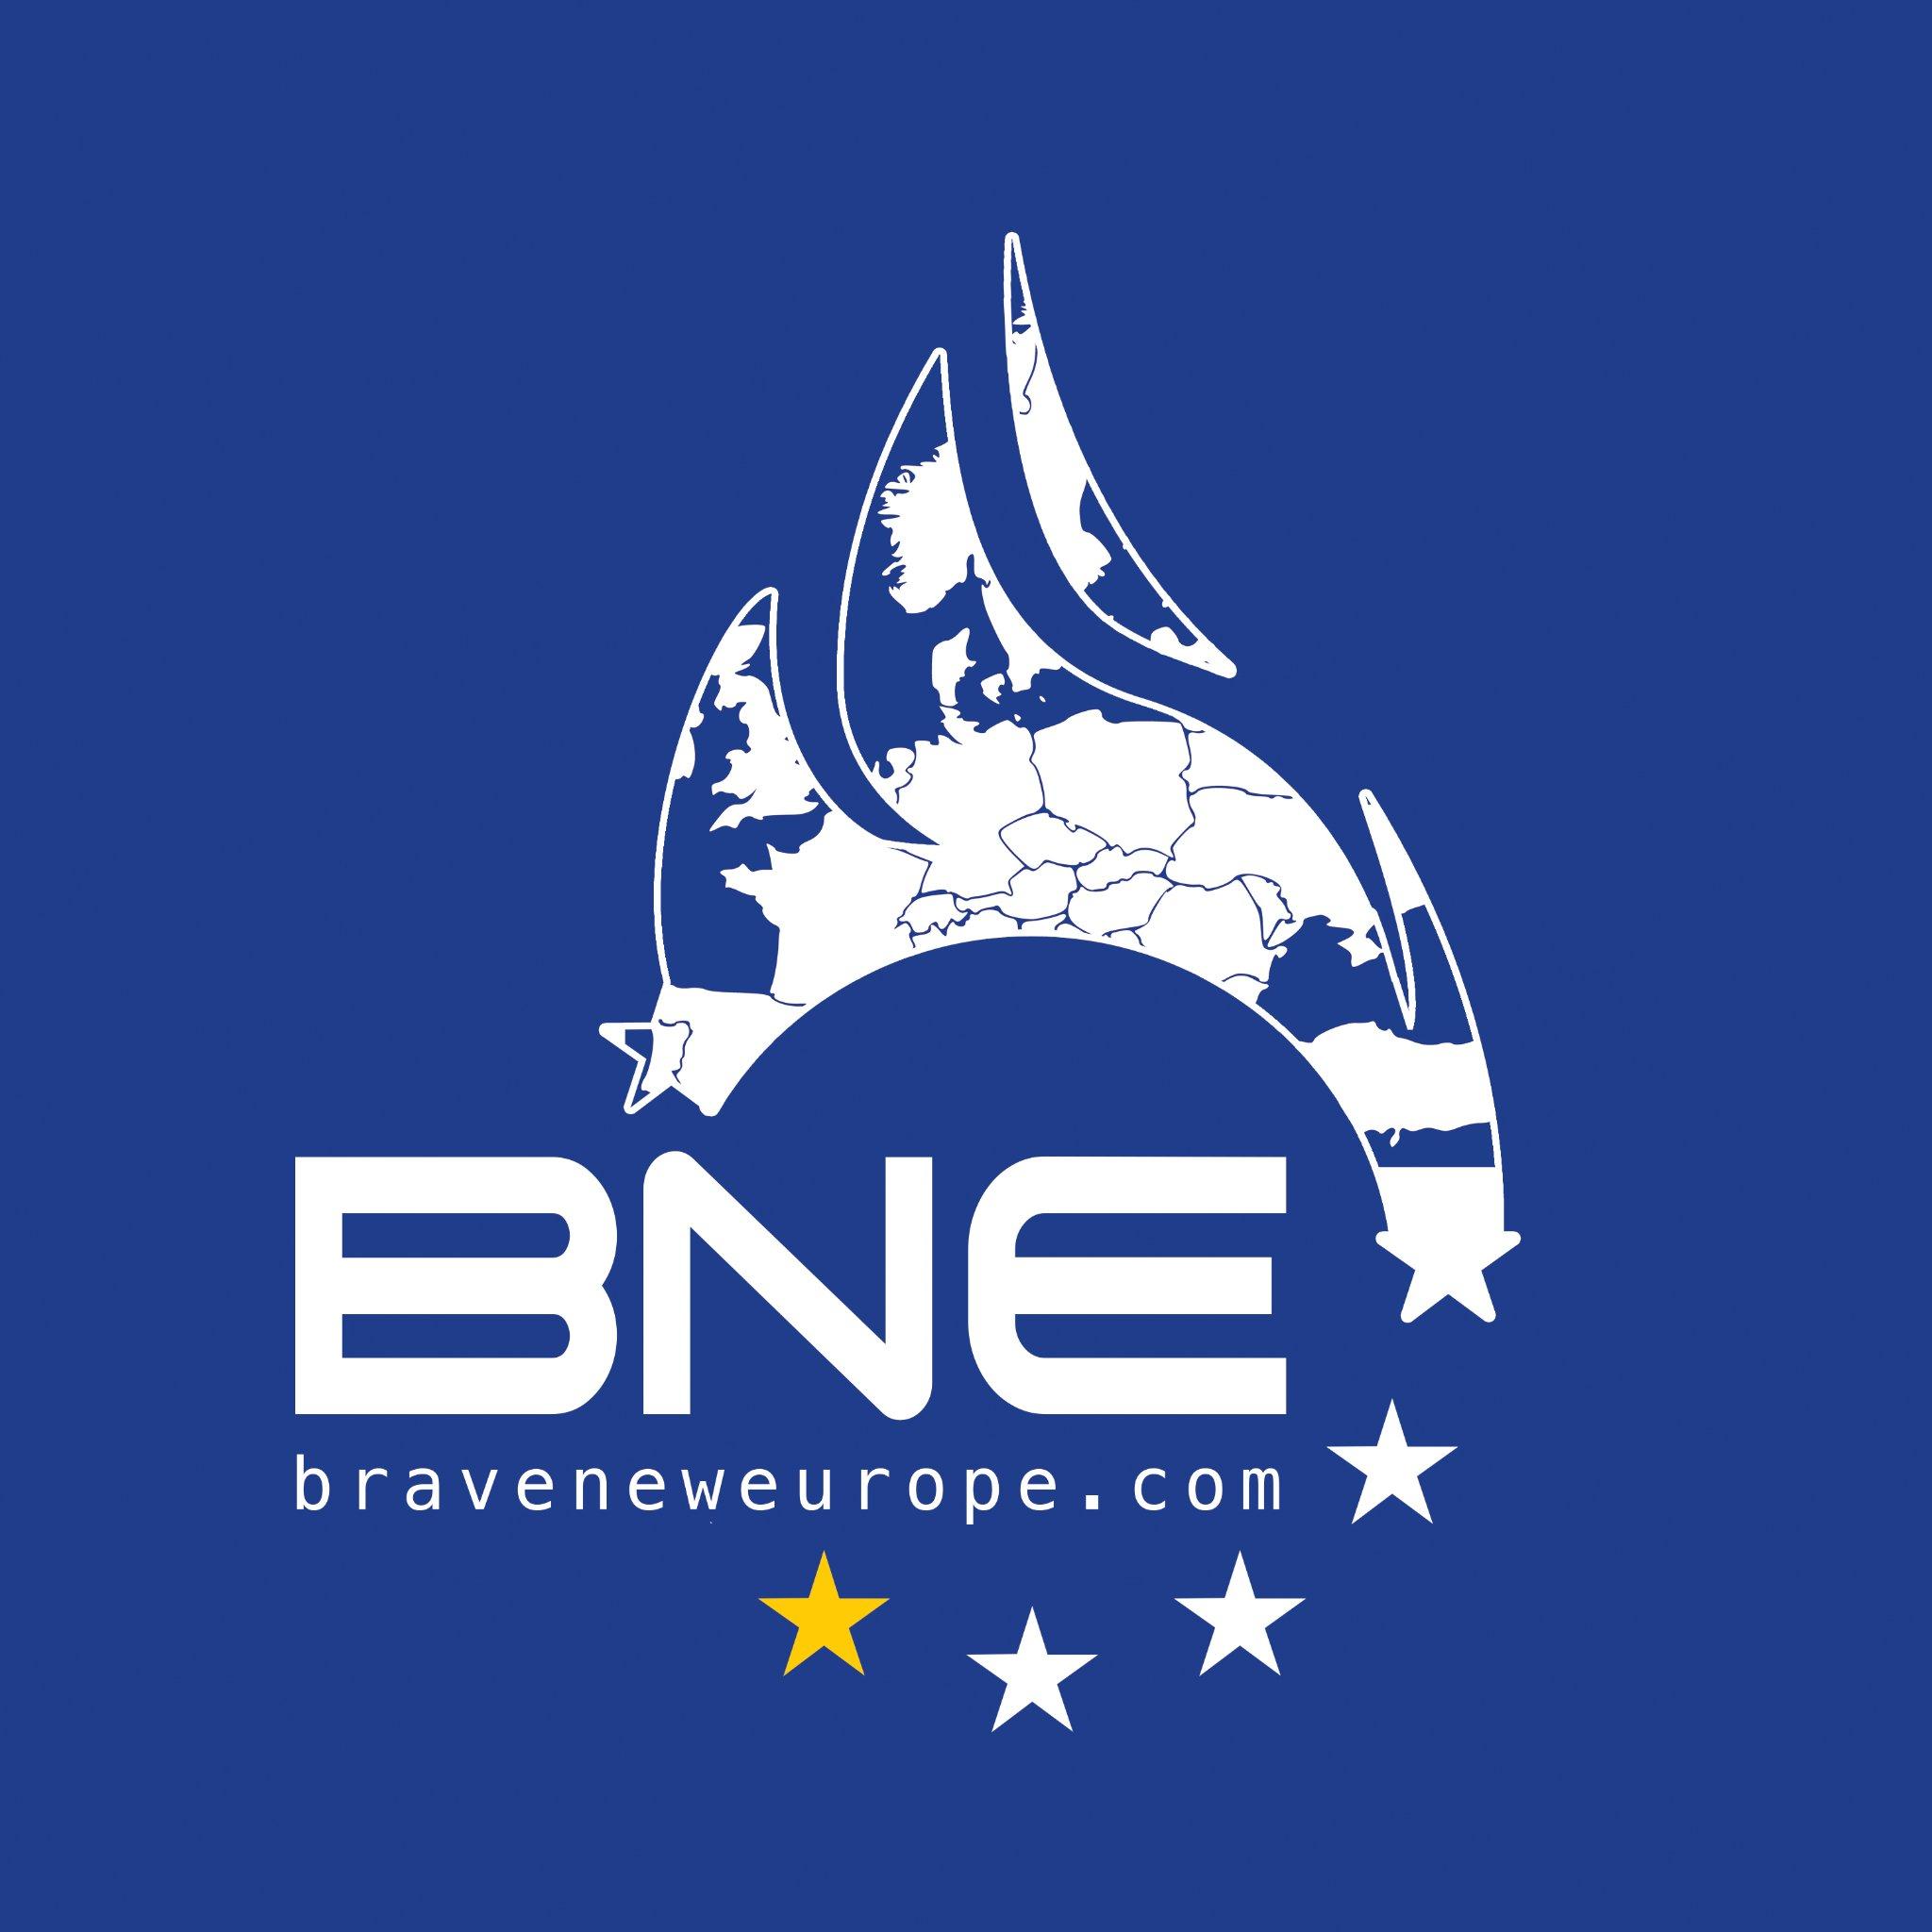 Brave New Europe